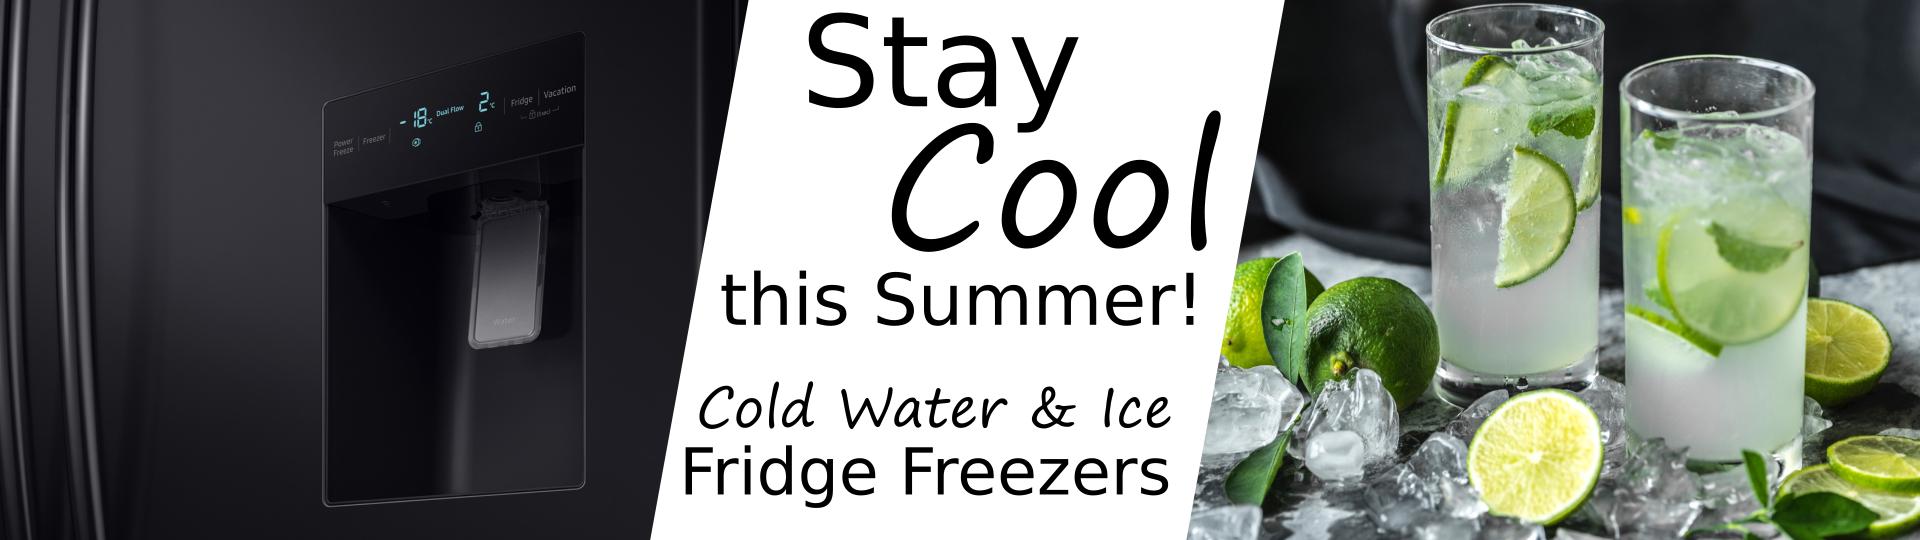 Fridge Freezers Ice & Water Dispensers